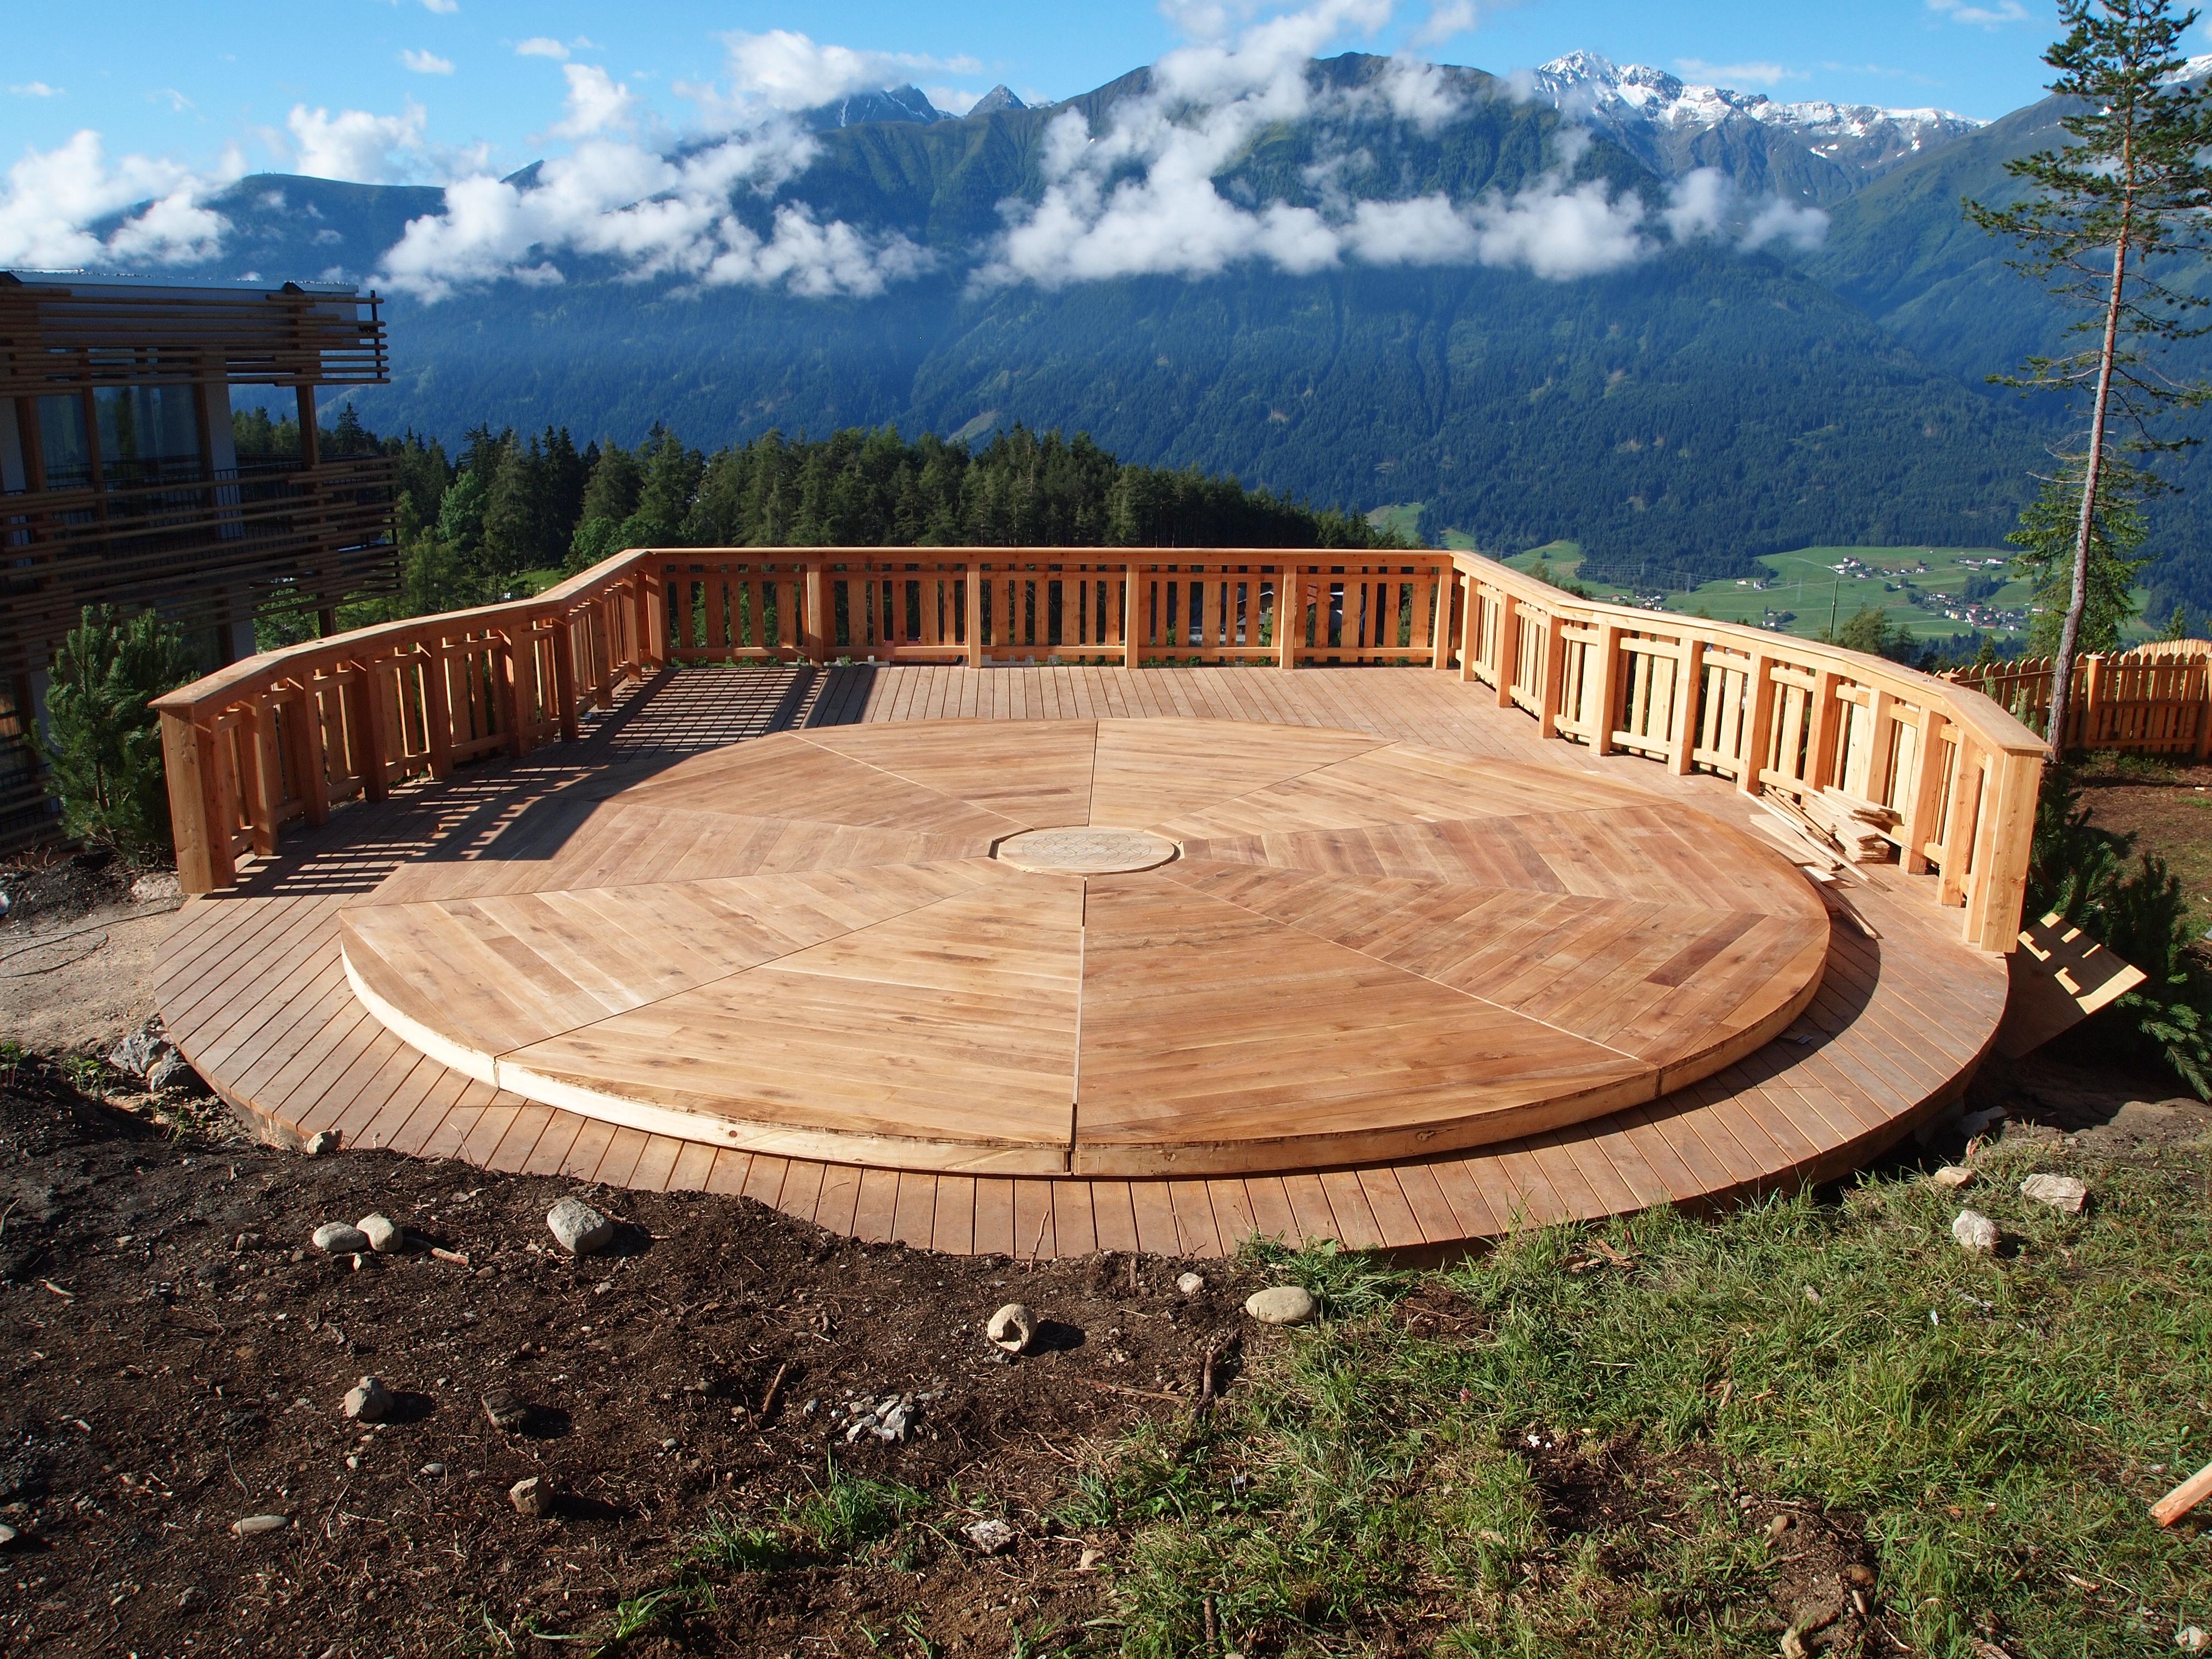 700cm platform - Austria